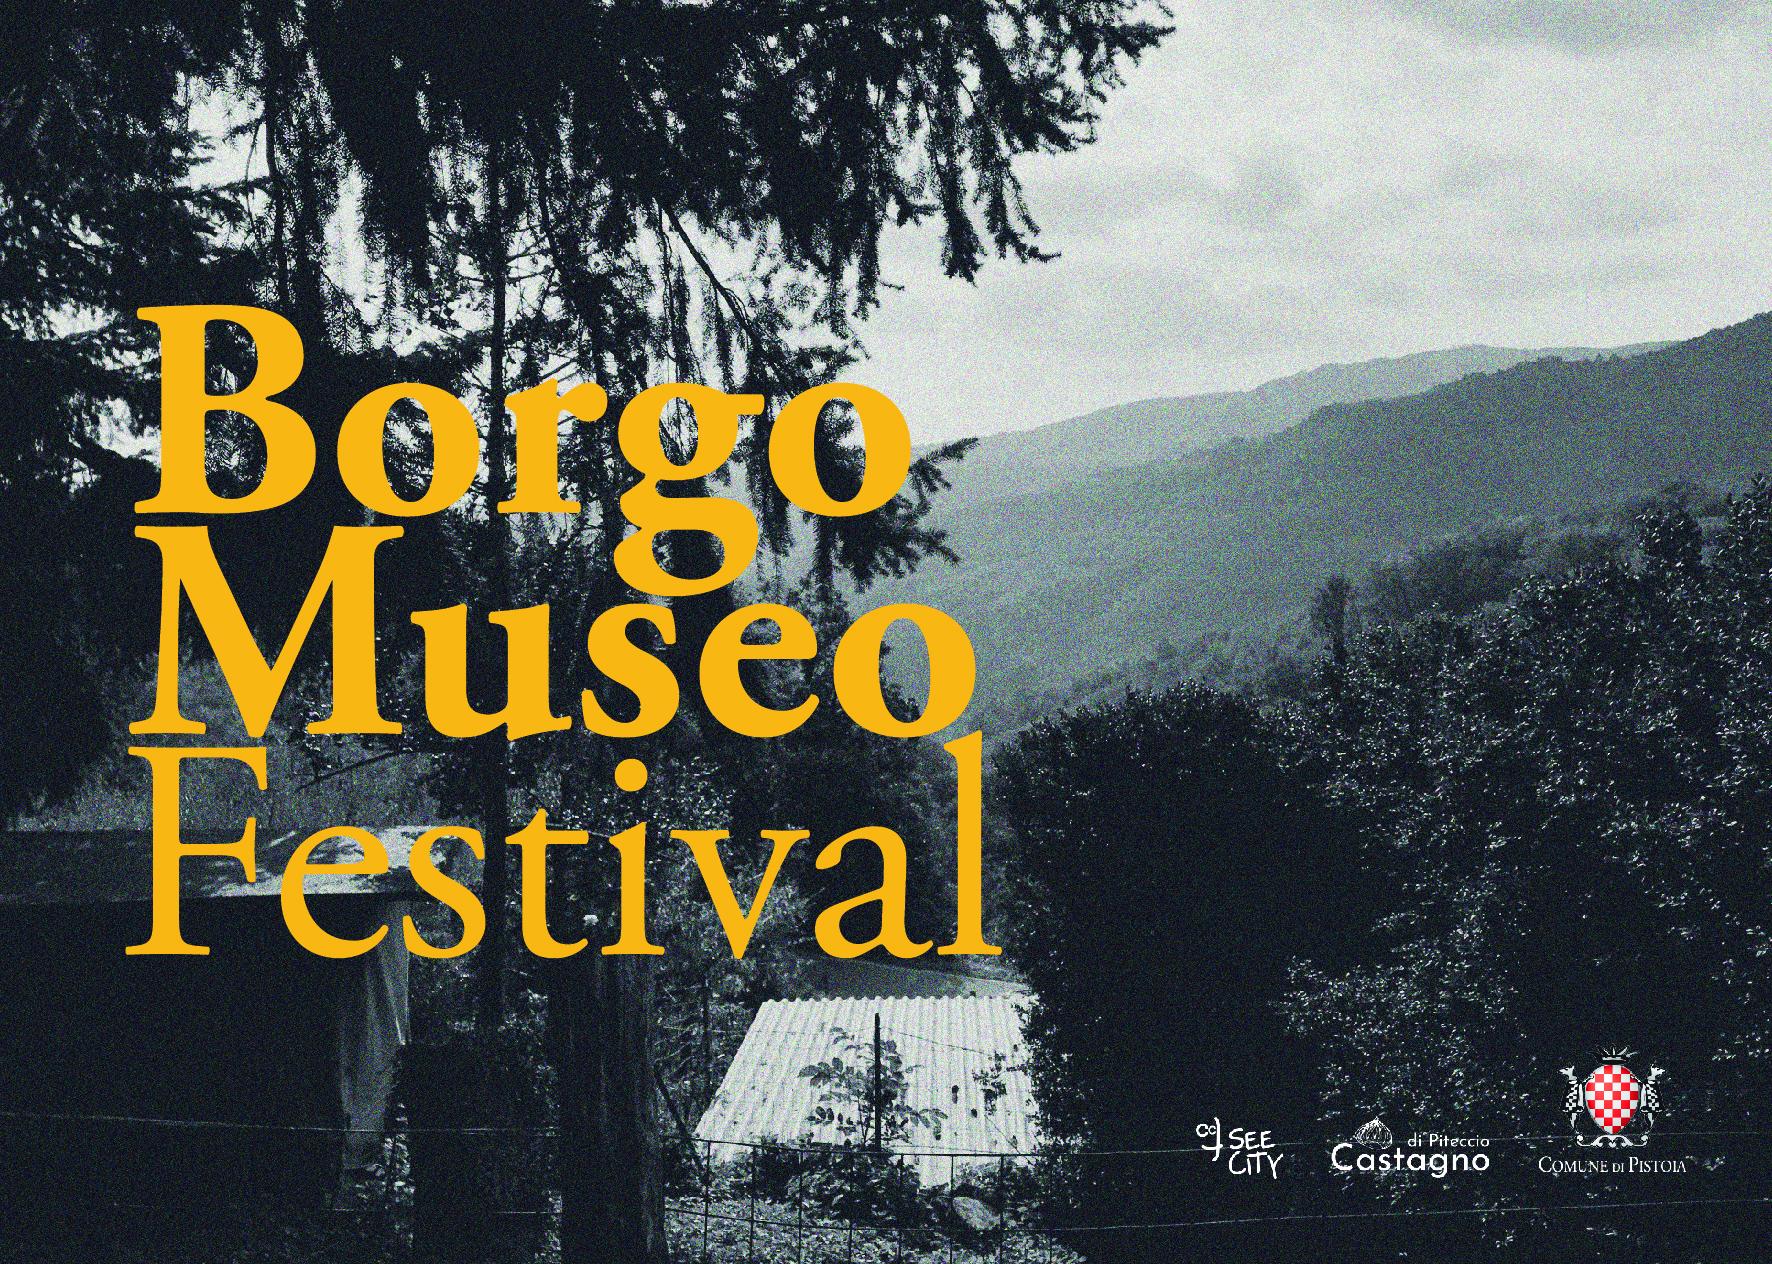 Borgo Museo Festival 2019 Cartolina 01 - loghi